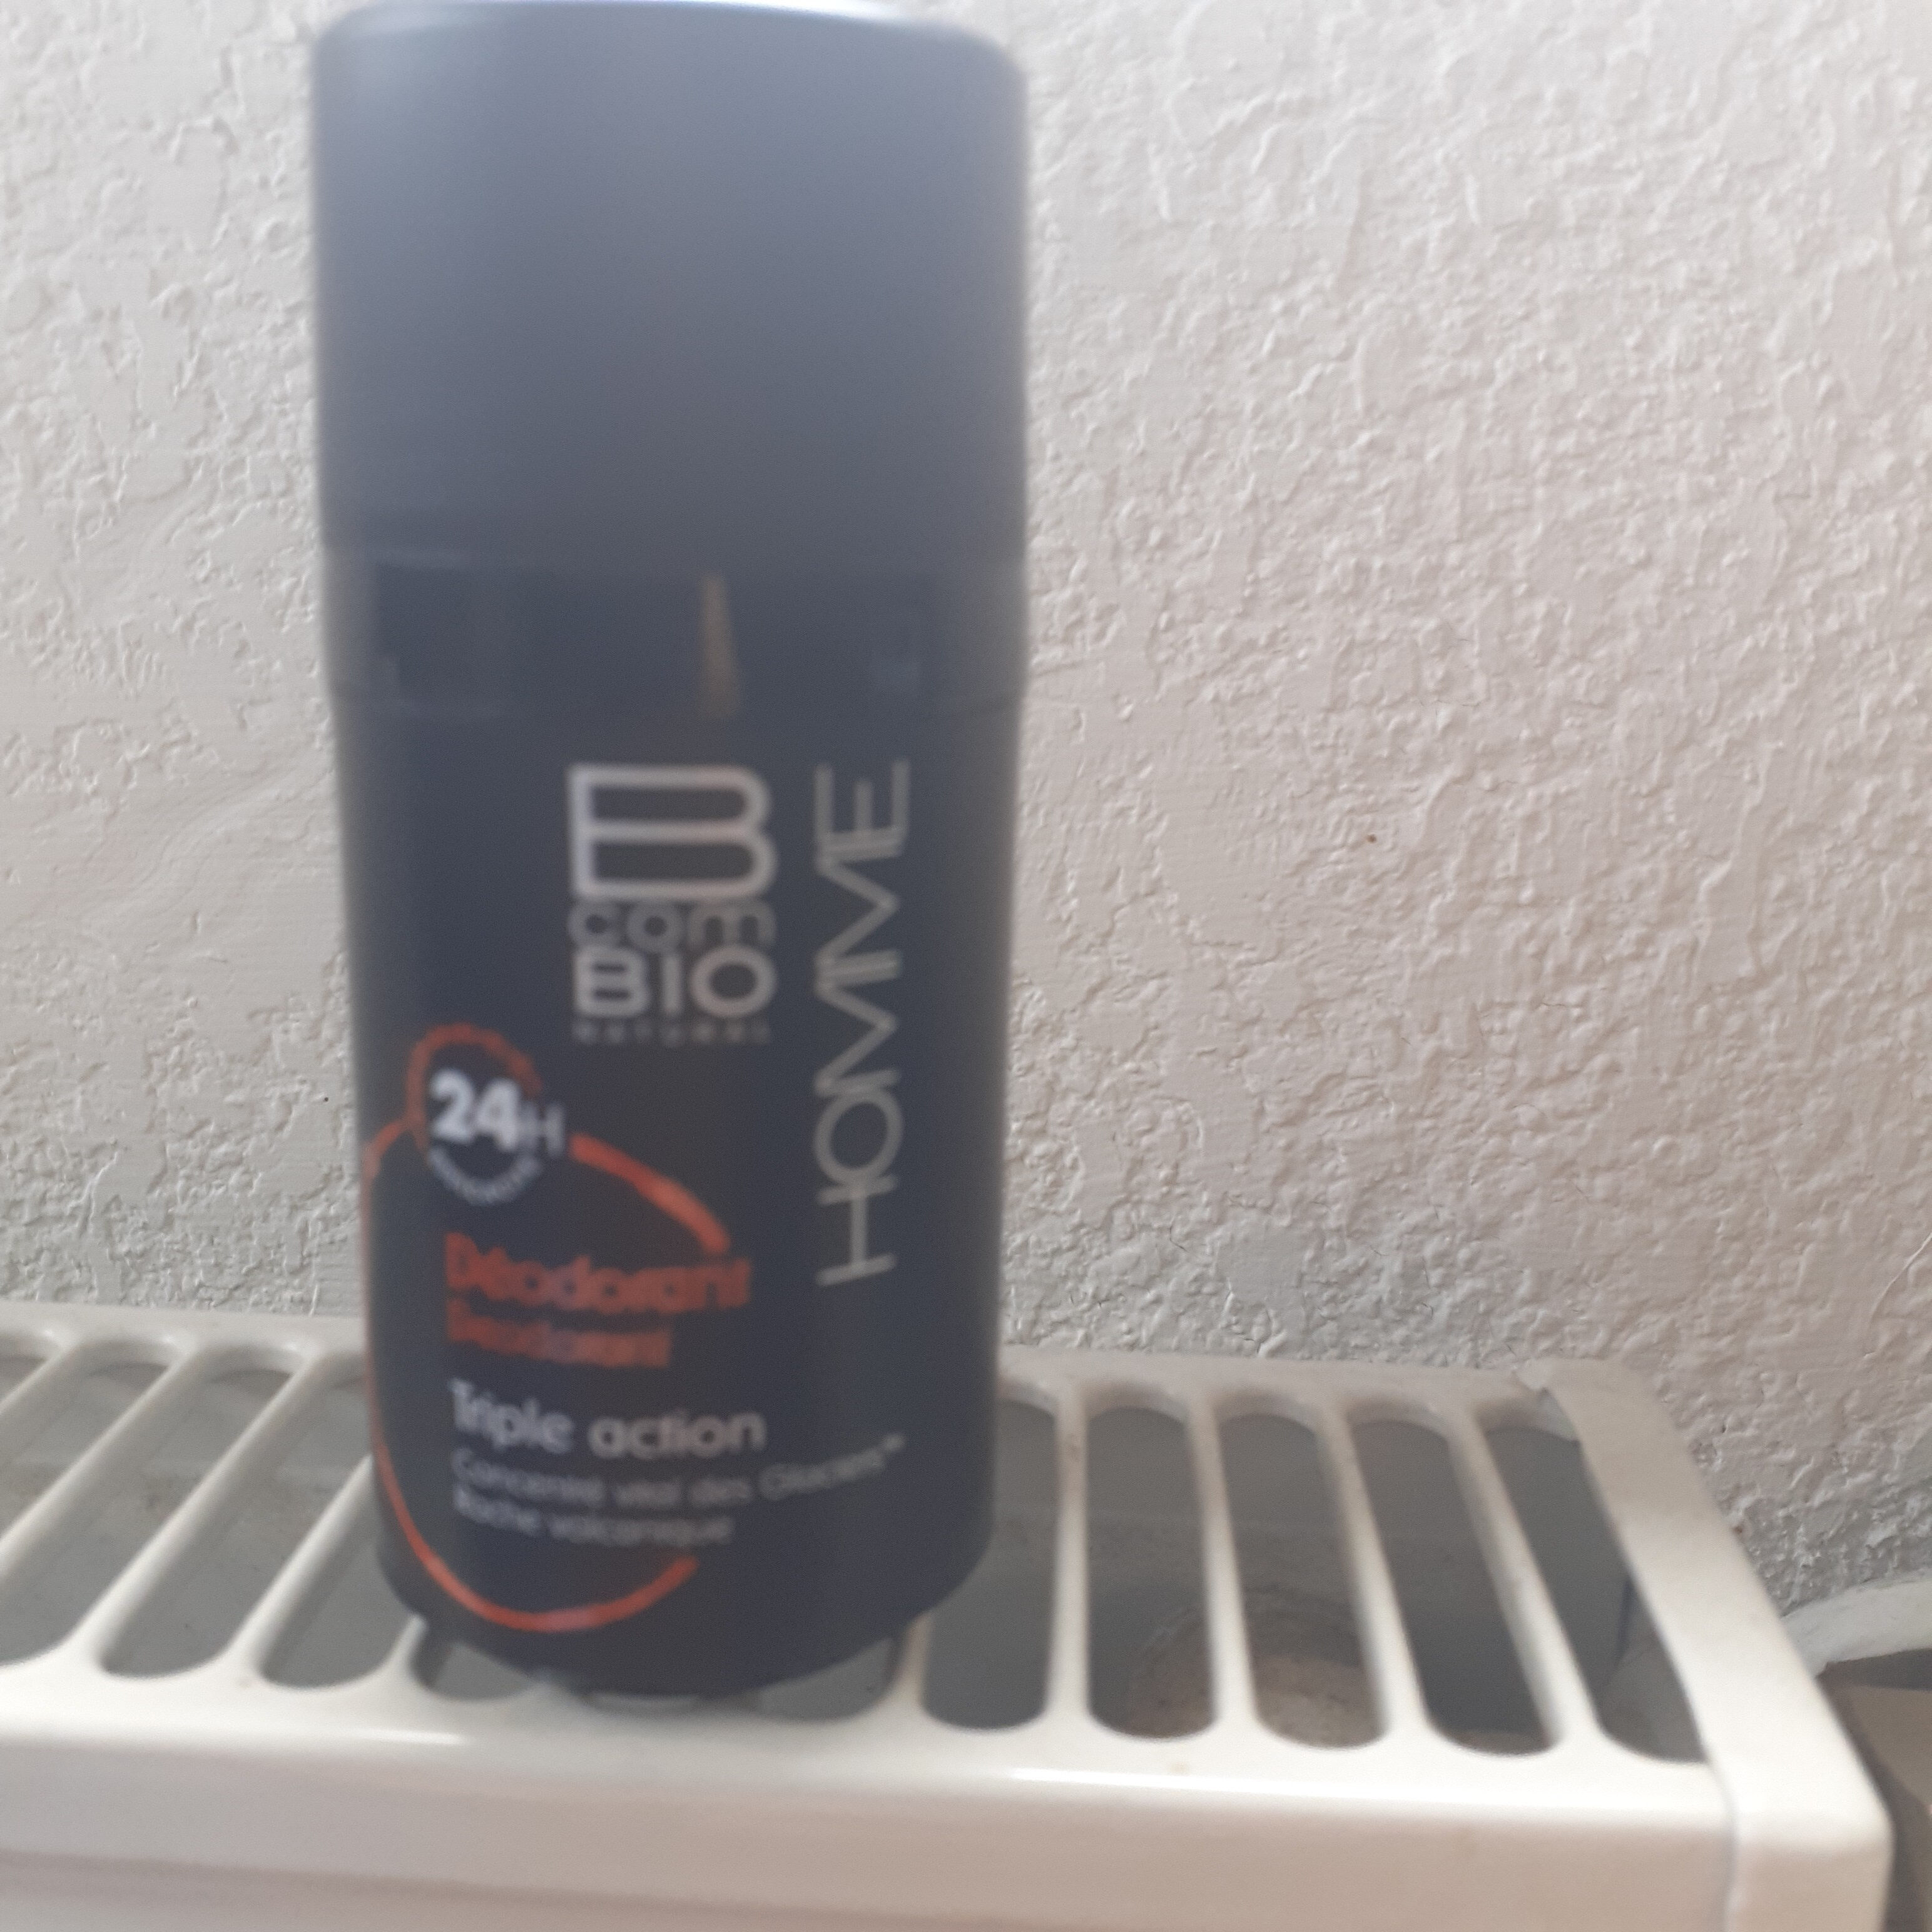 B com bio natural homme - Product - fr